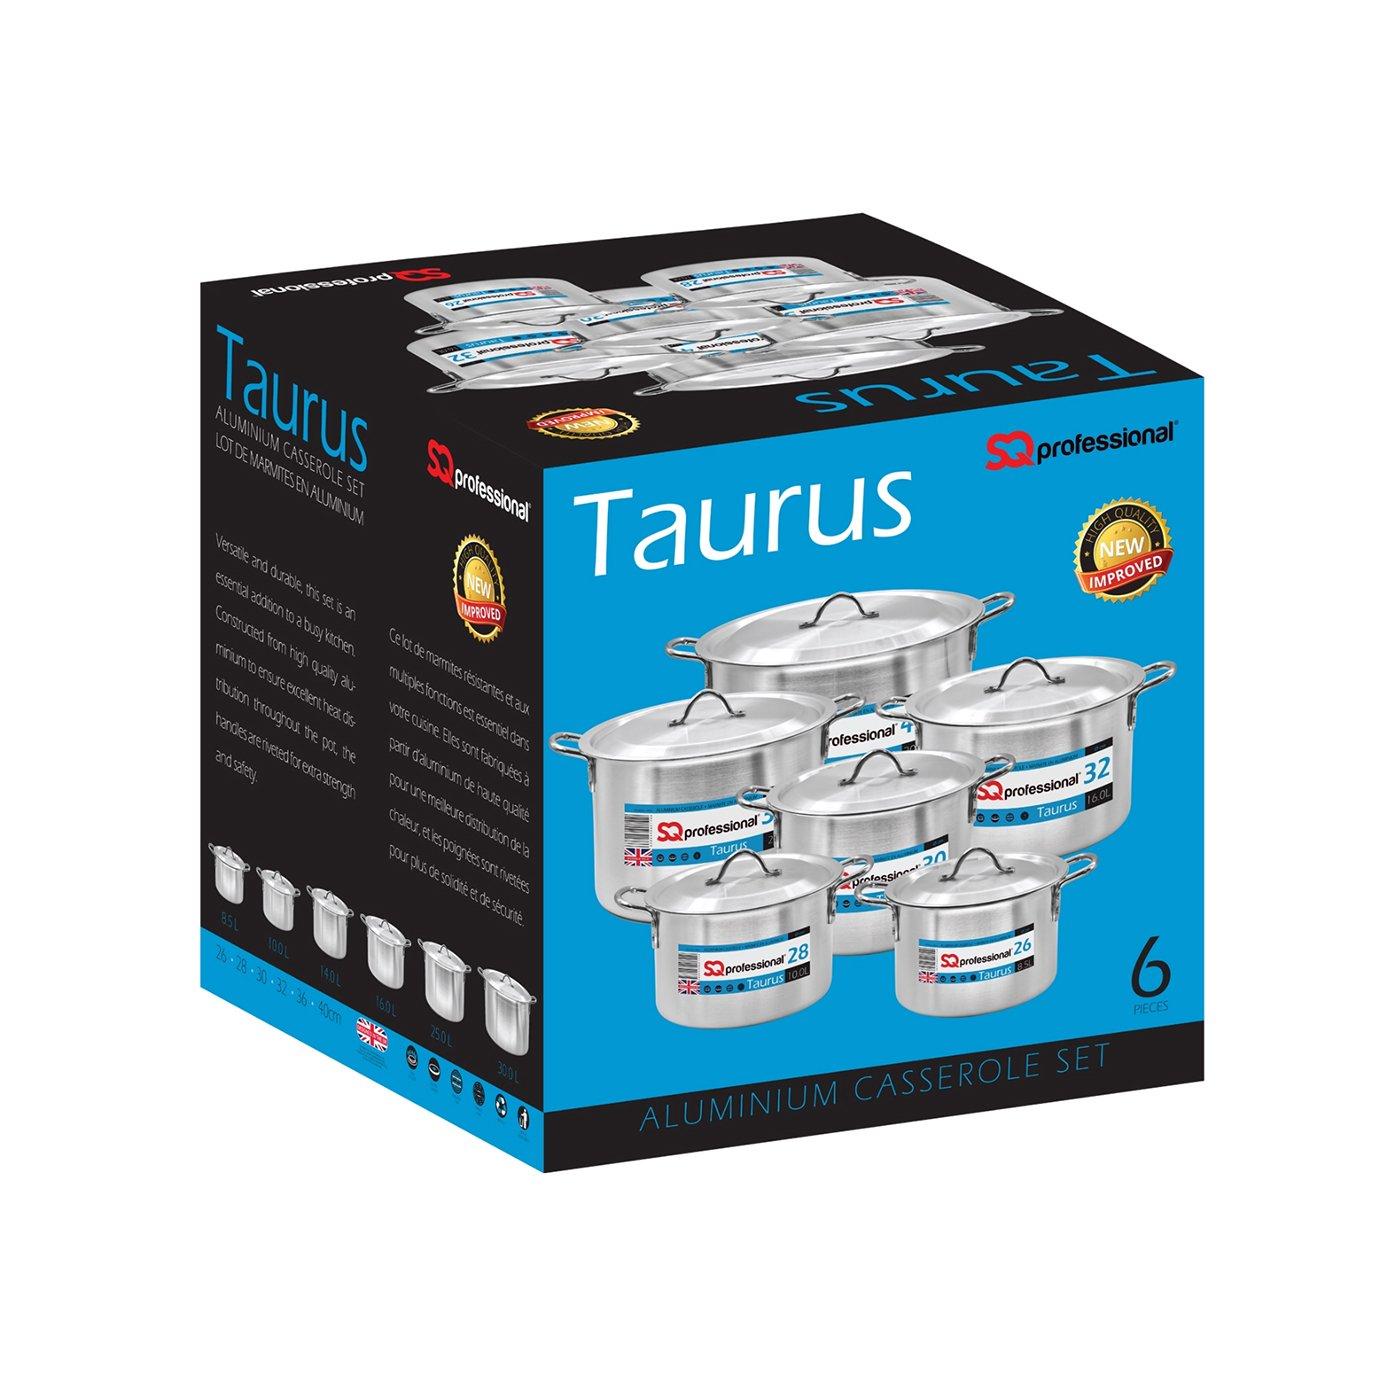 40/cm Argent SQ Professional 6pi/èce Ensemble de casserole en aluminium Taurus 26